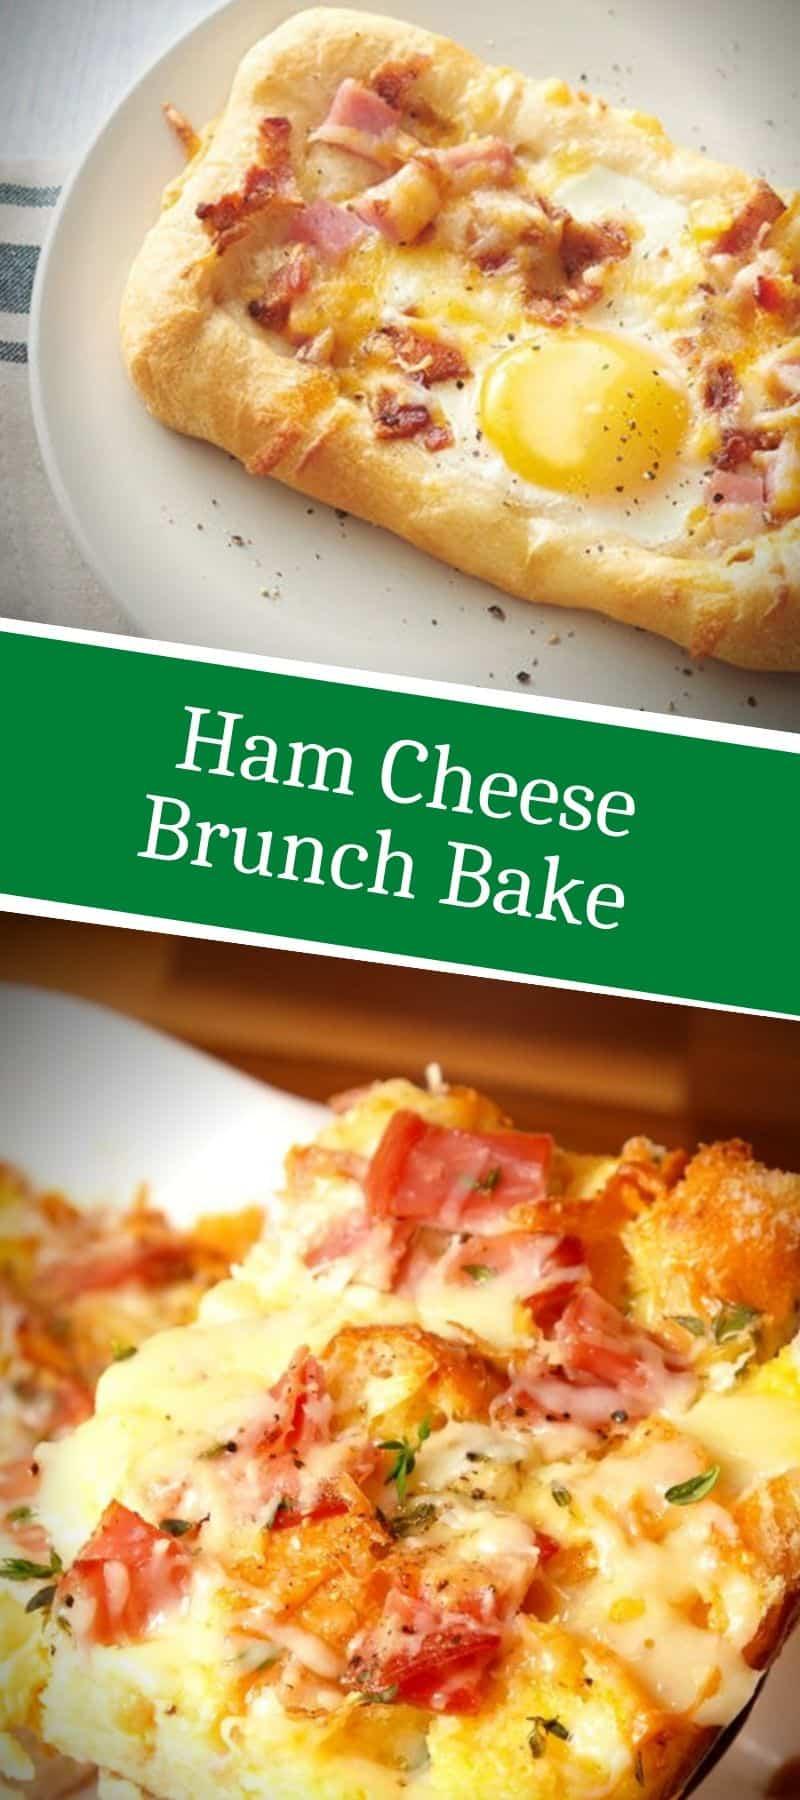 Ham Cheese Brunch Bake Recipe 3